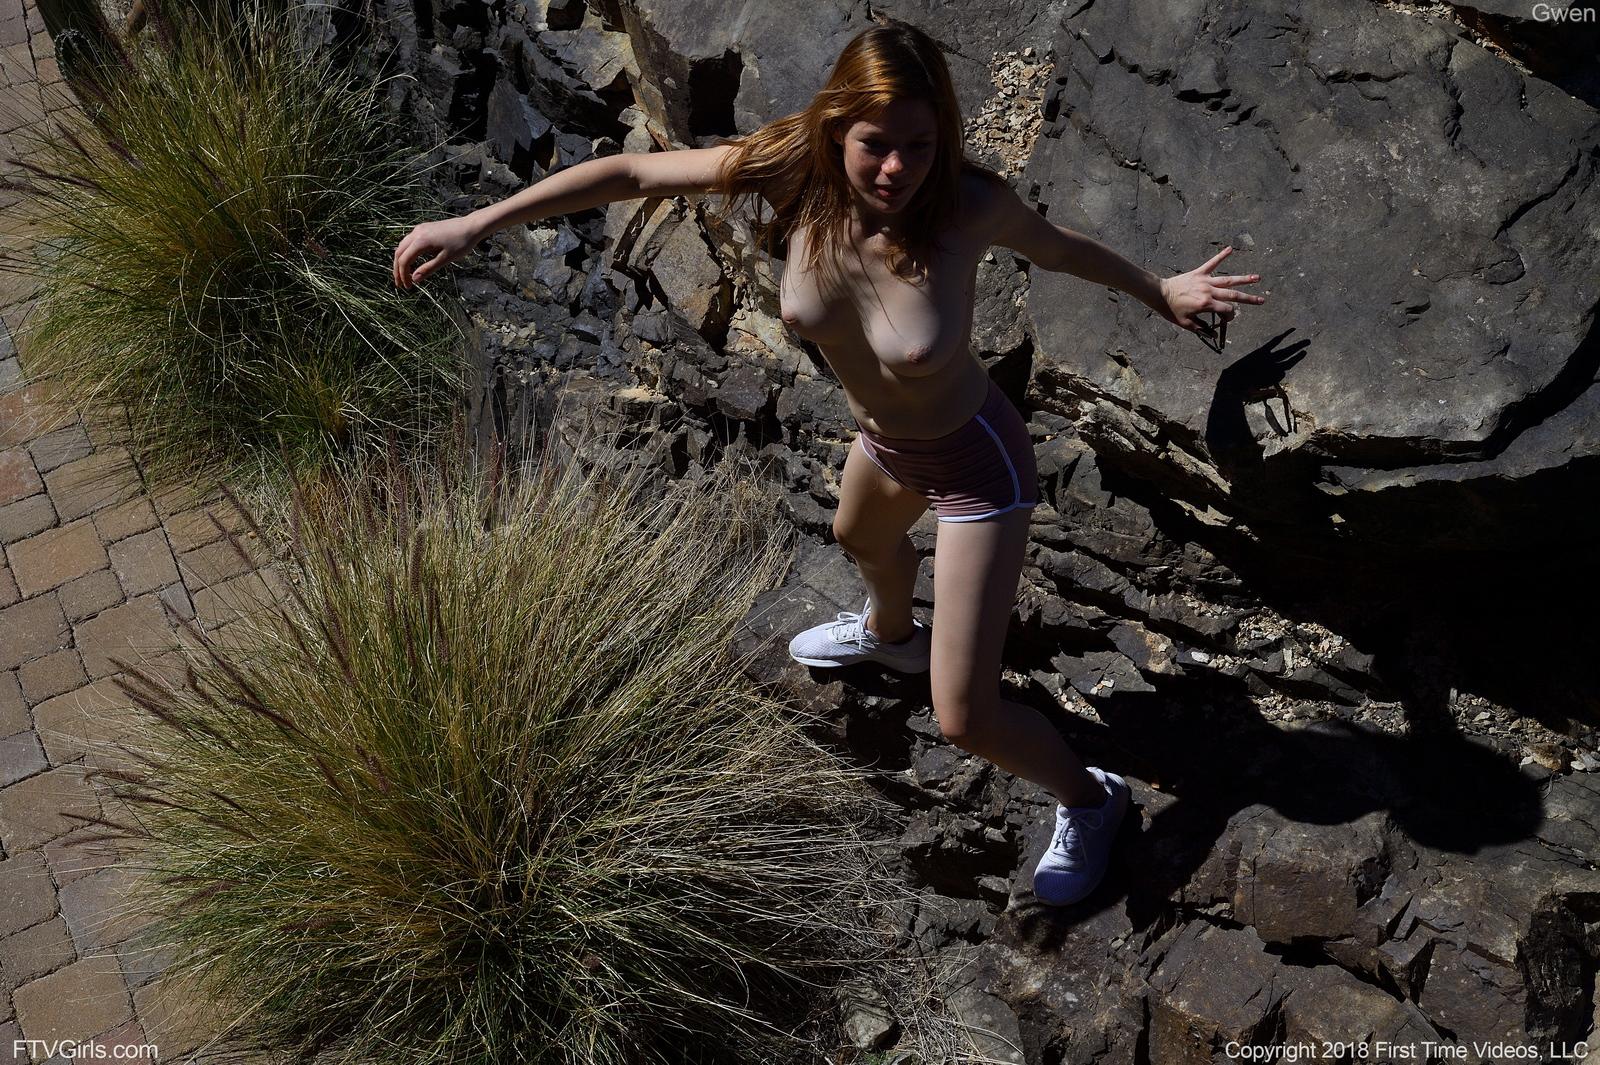 gwen-redhead-young-freckled-girl-nude-ftvgirls-14